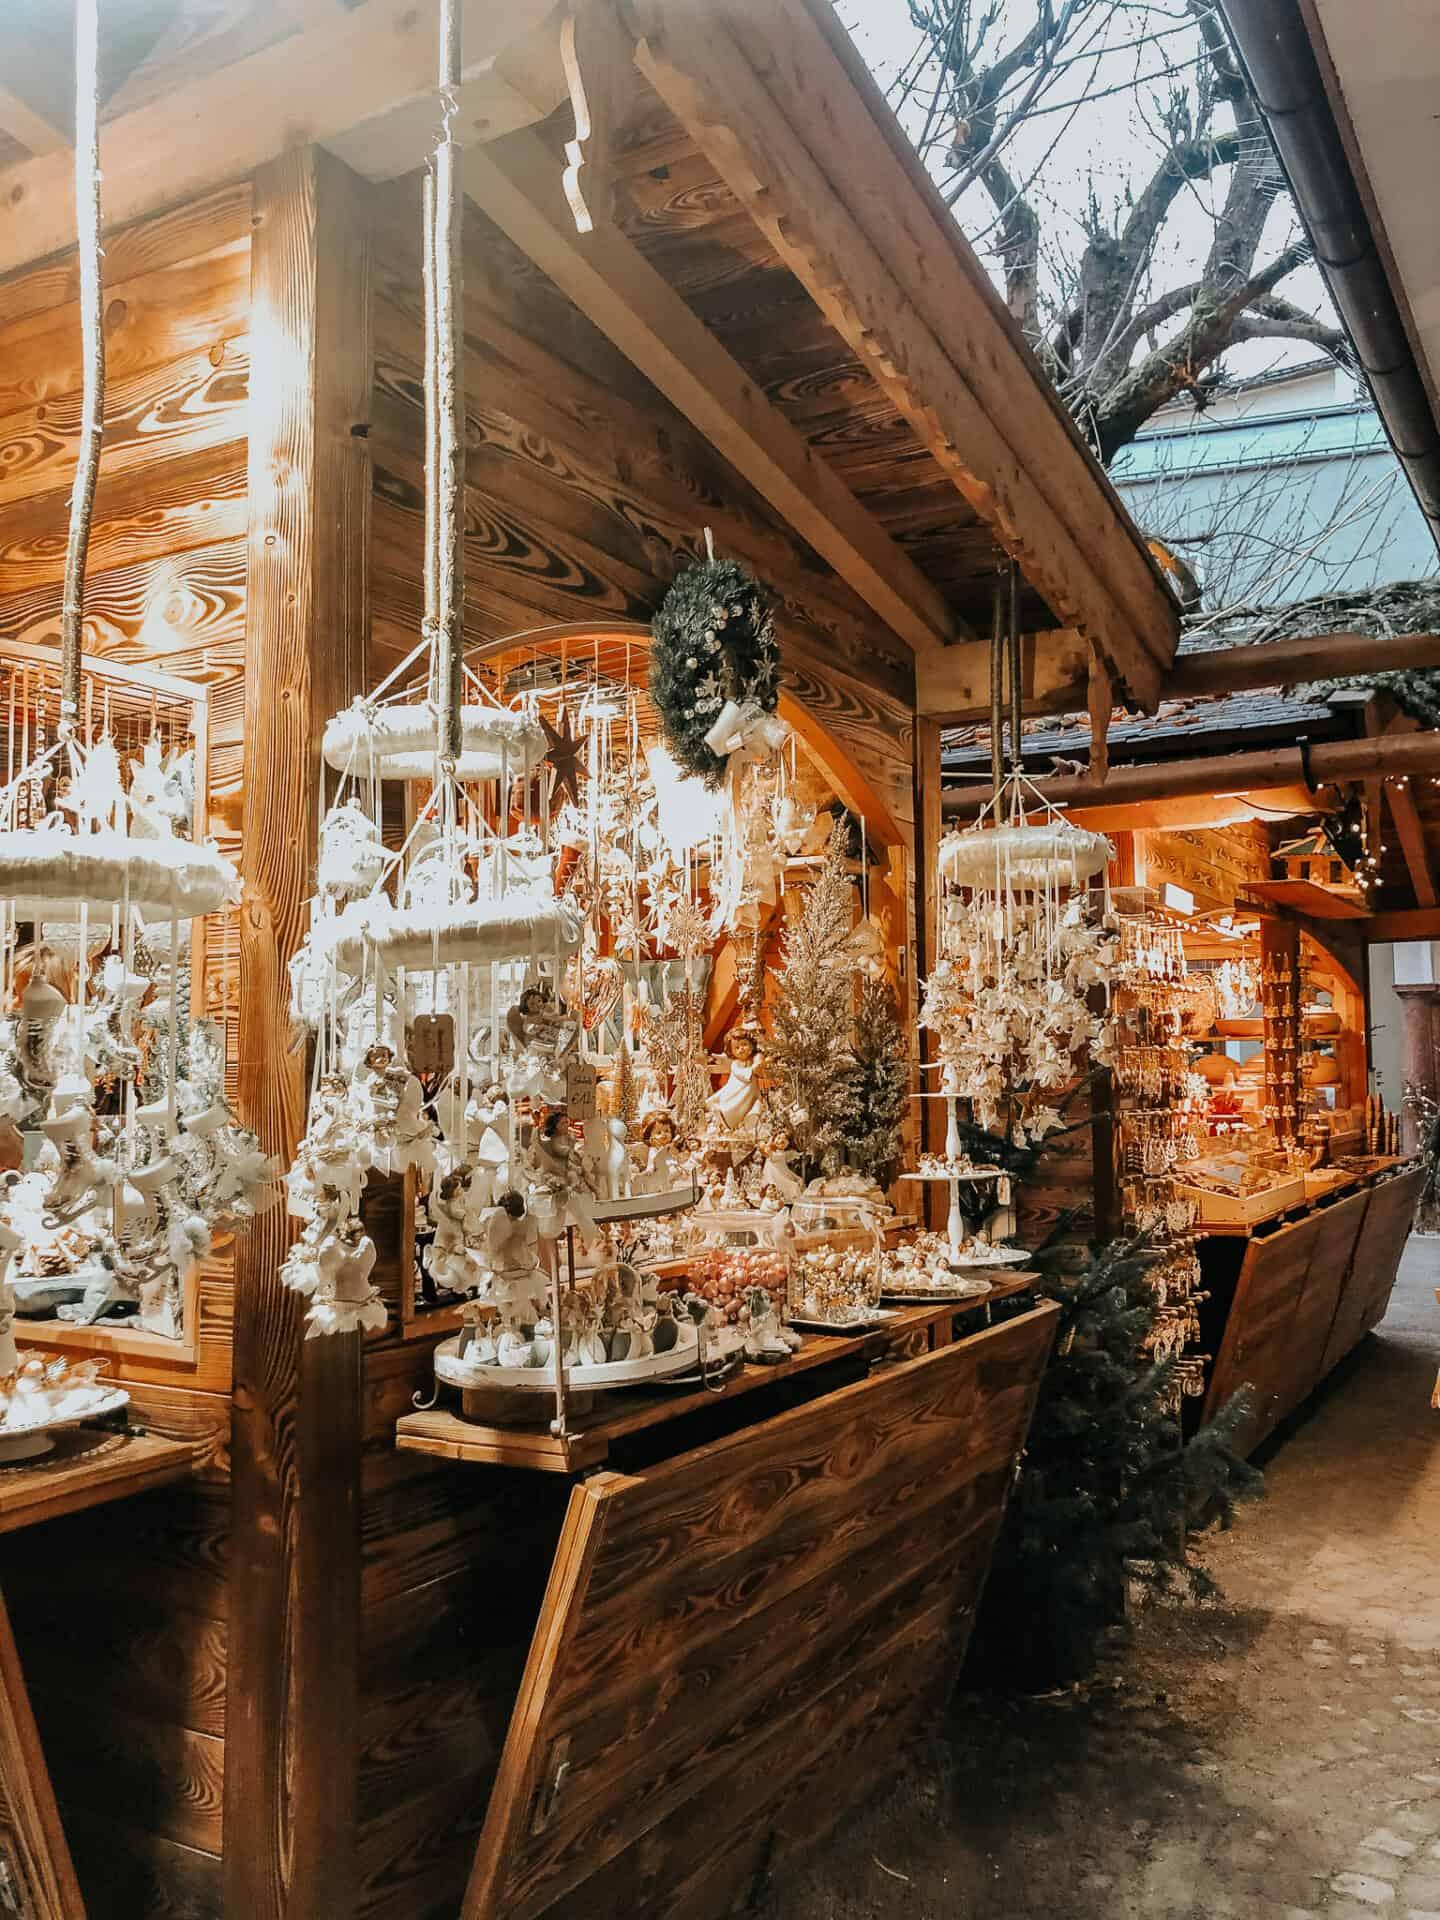 Sazlburg Christmas market wooden stall